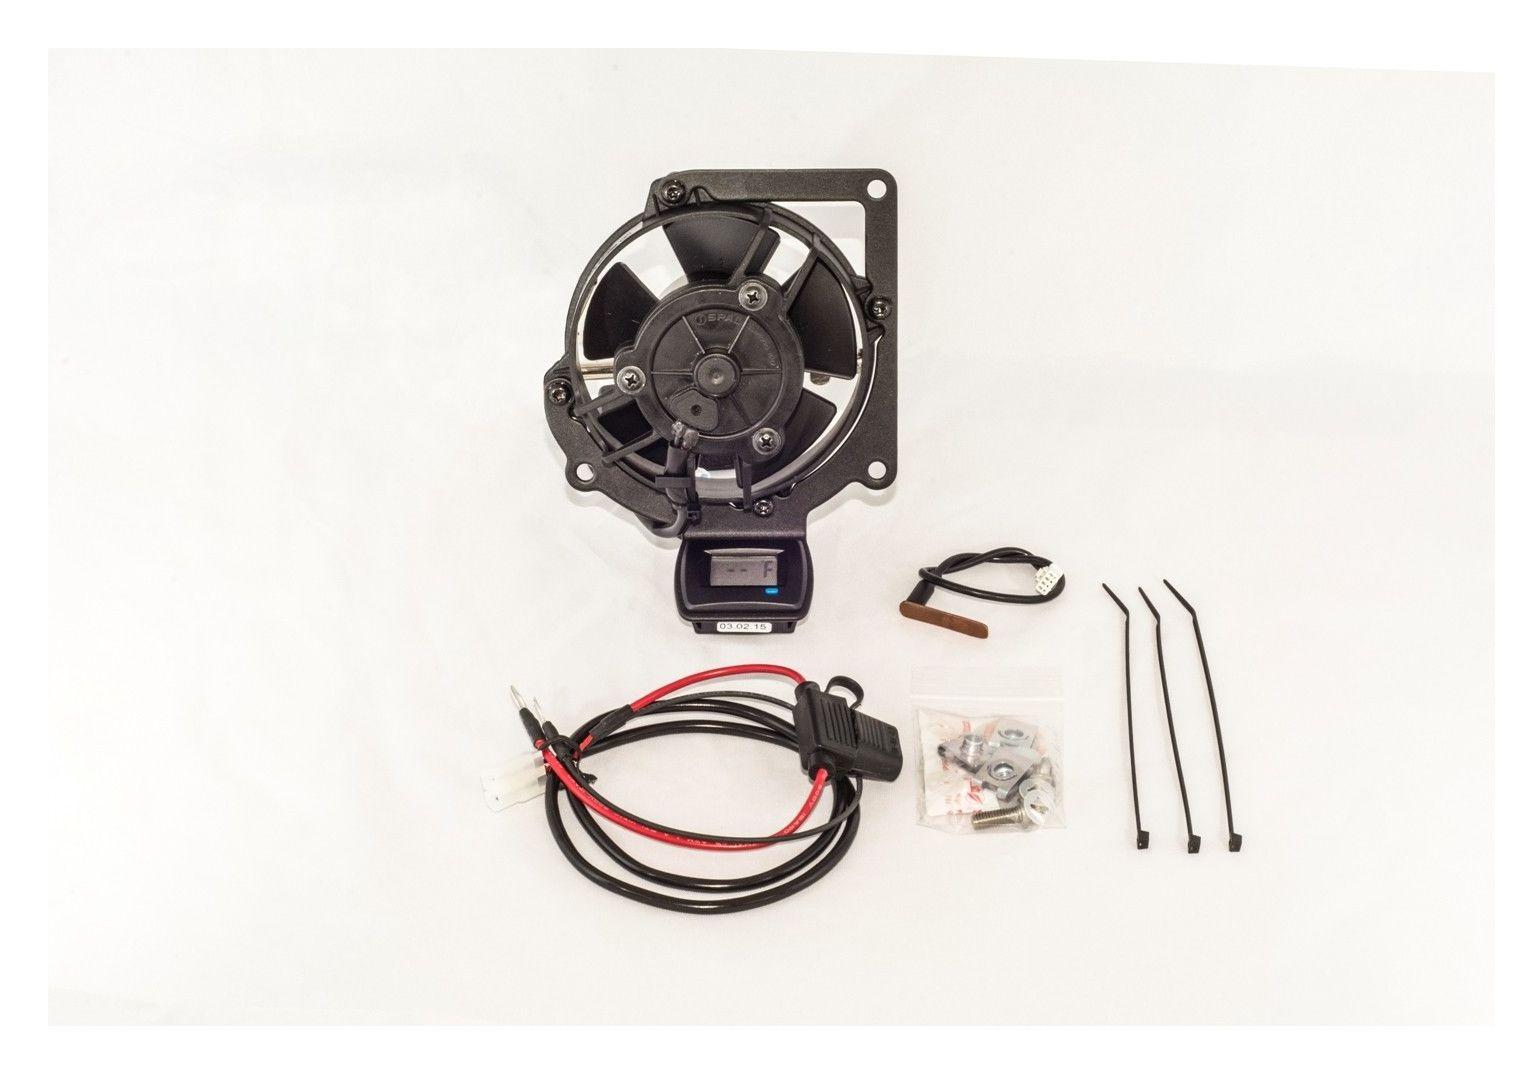 Trail Tech Radiator Fan Kit Yamaha Yz250fx Yz450fx 2015